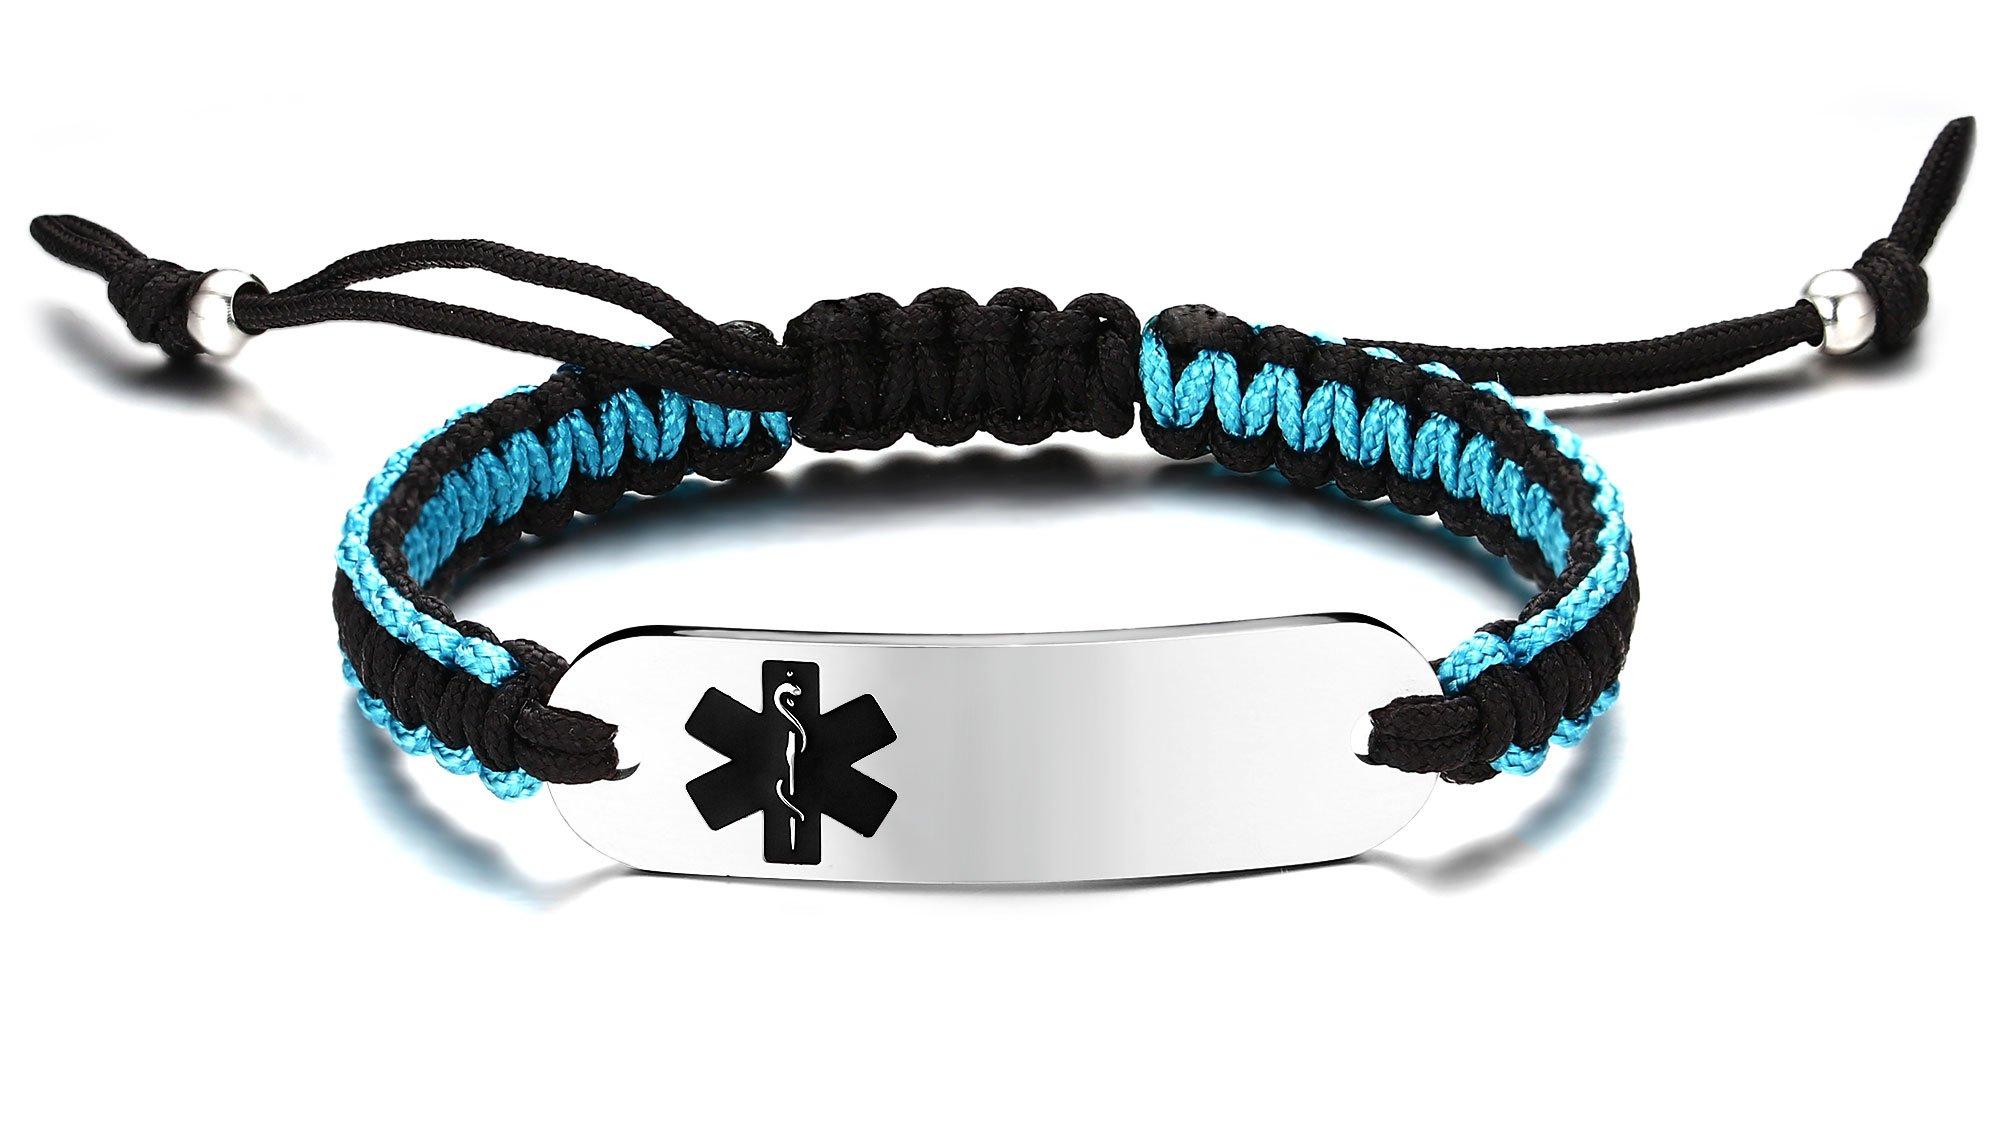 JF.JEWELRY Two-Tone Nylon Rope Handmade Medical ID Alert Bracelet Stainless Steel Tag Custom Engraved-Black